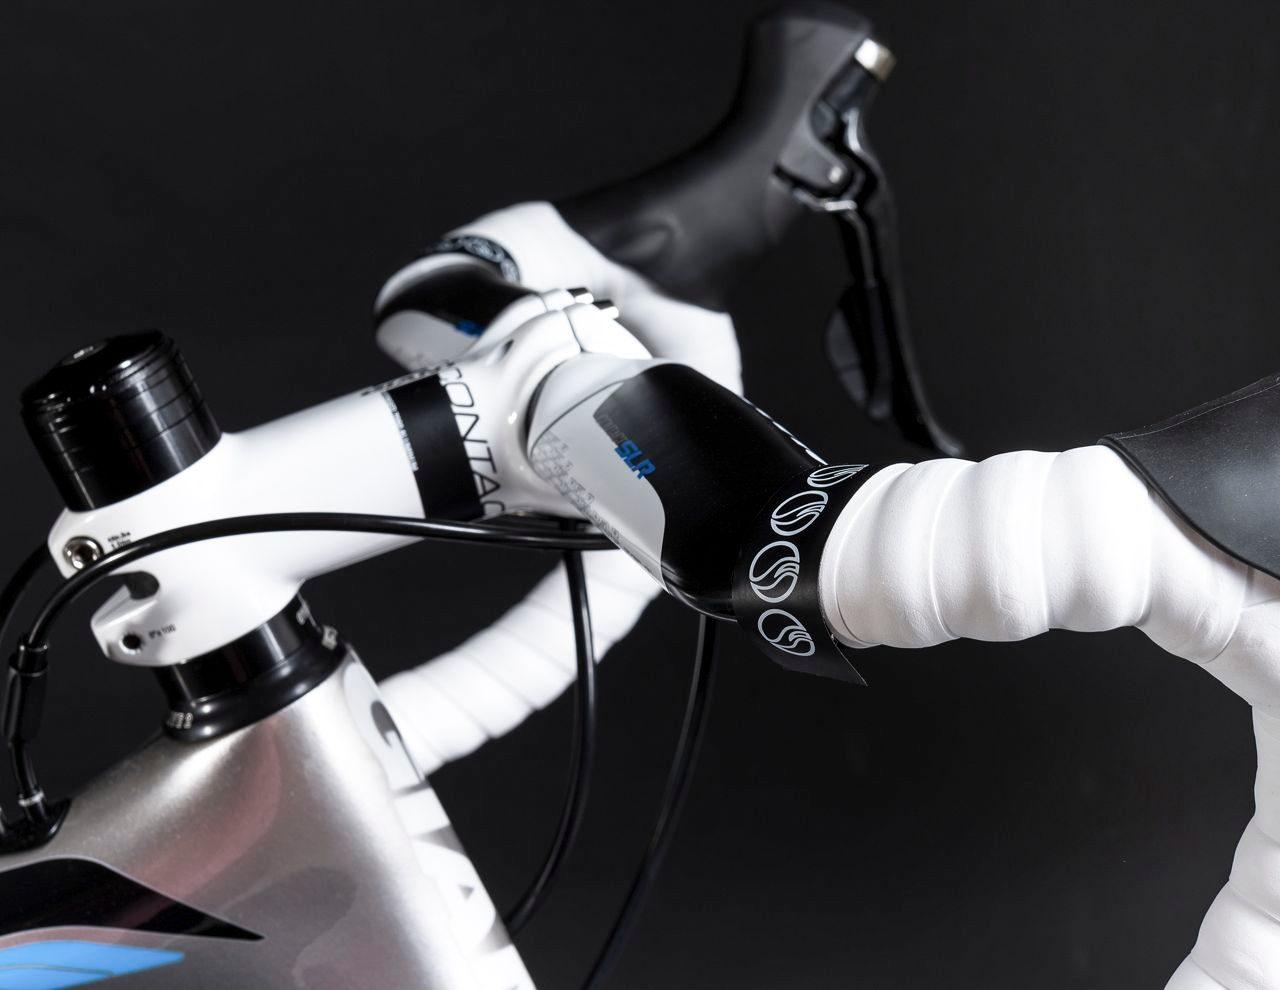 Profiled aero bars on Giant Propel Advanced 2 road bike